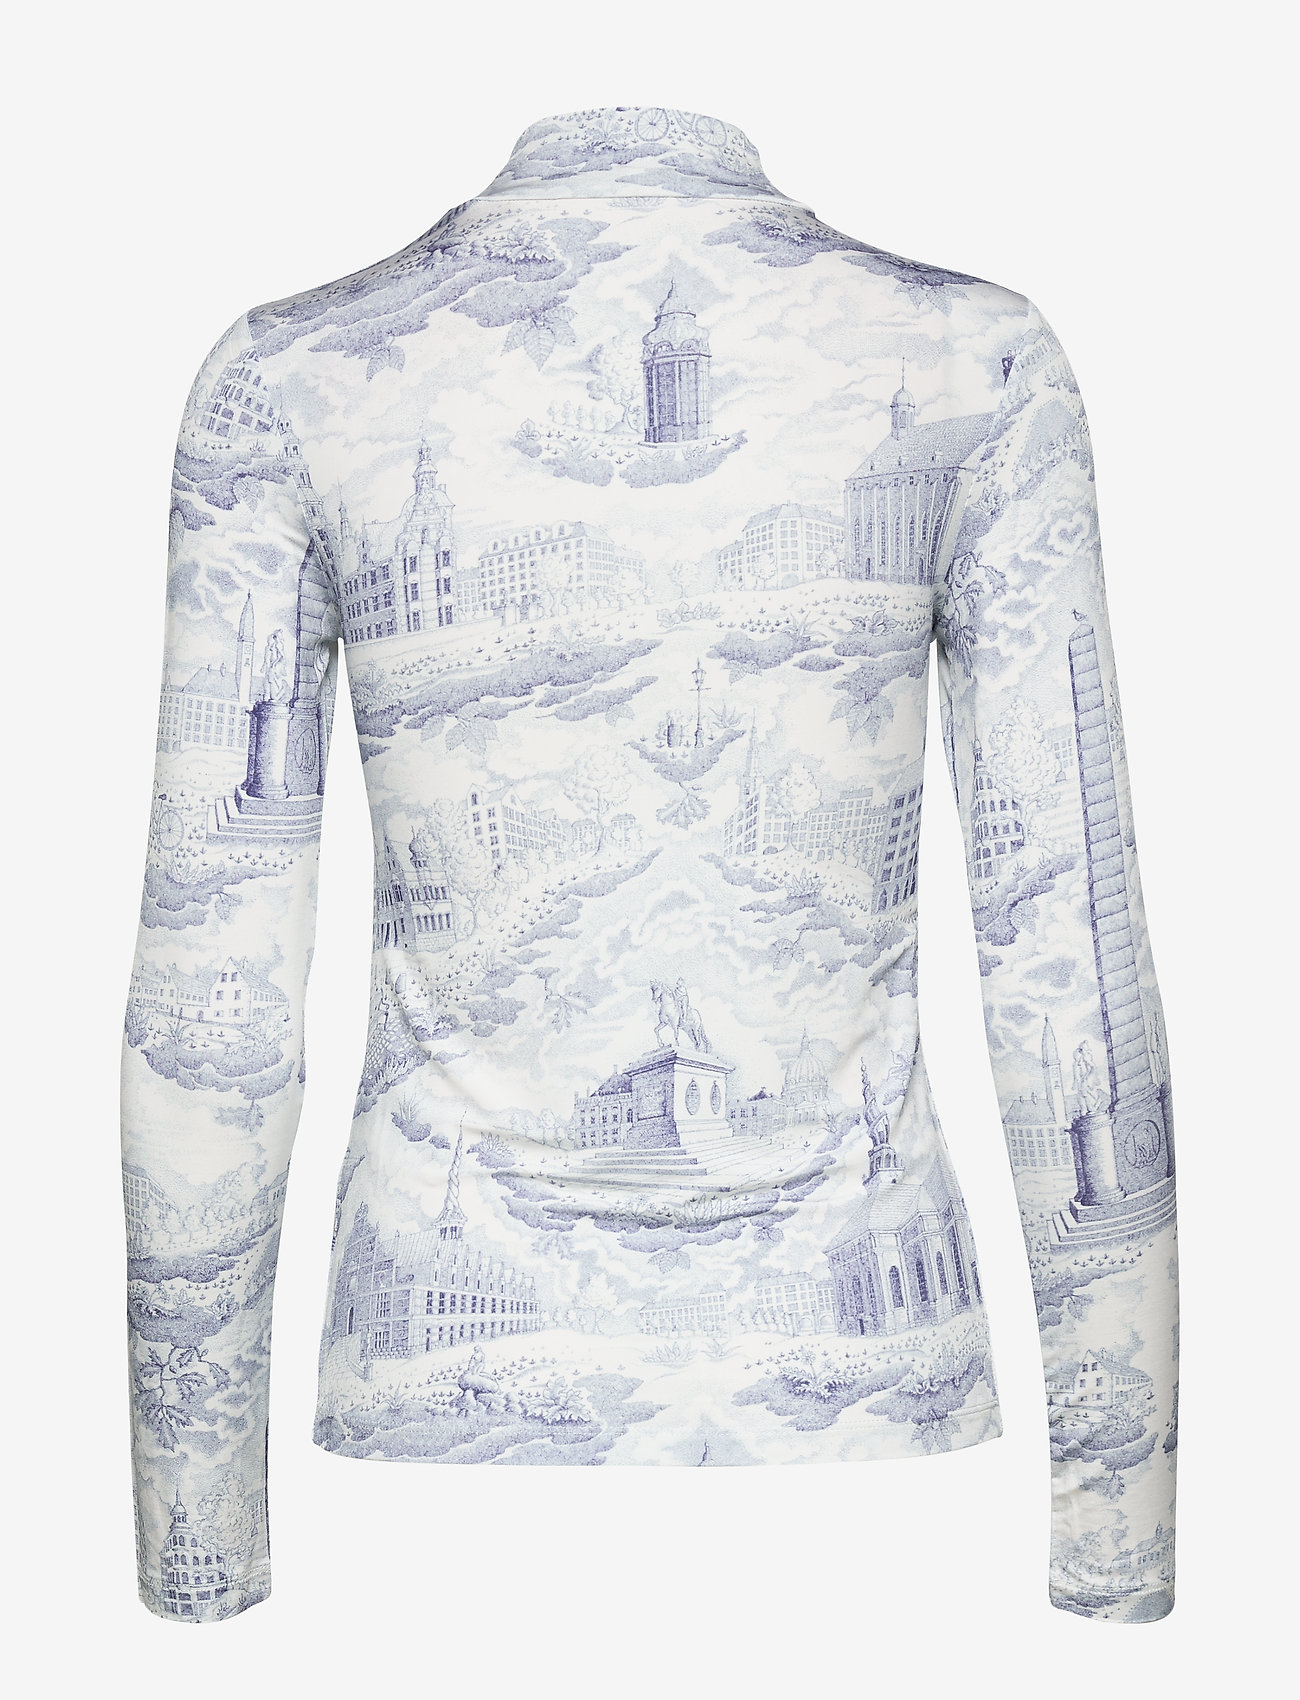 Samsøe Samsøe Elsi t-n t-shirt ls aop 10908 - T-shirty i zopy CITY OF TOWERS - Kobiety Odzież.